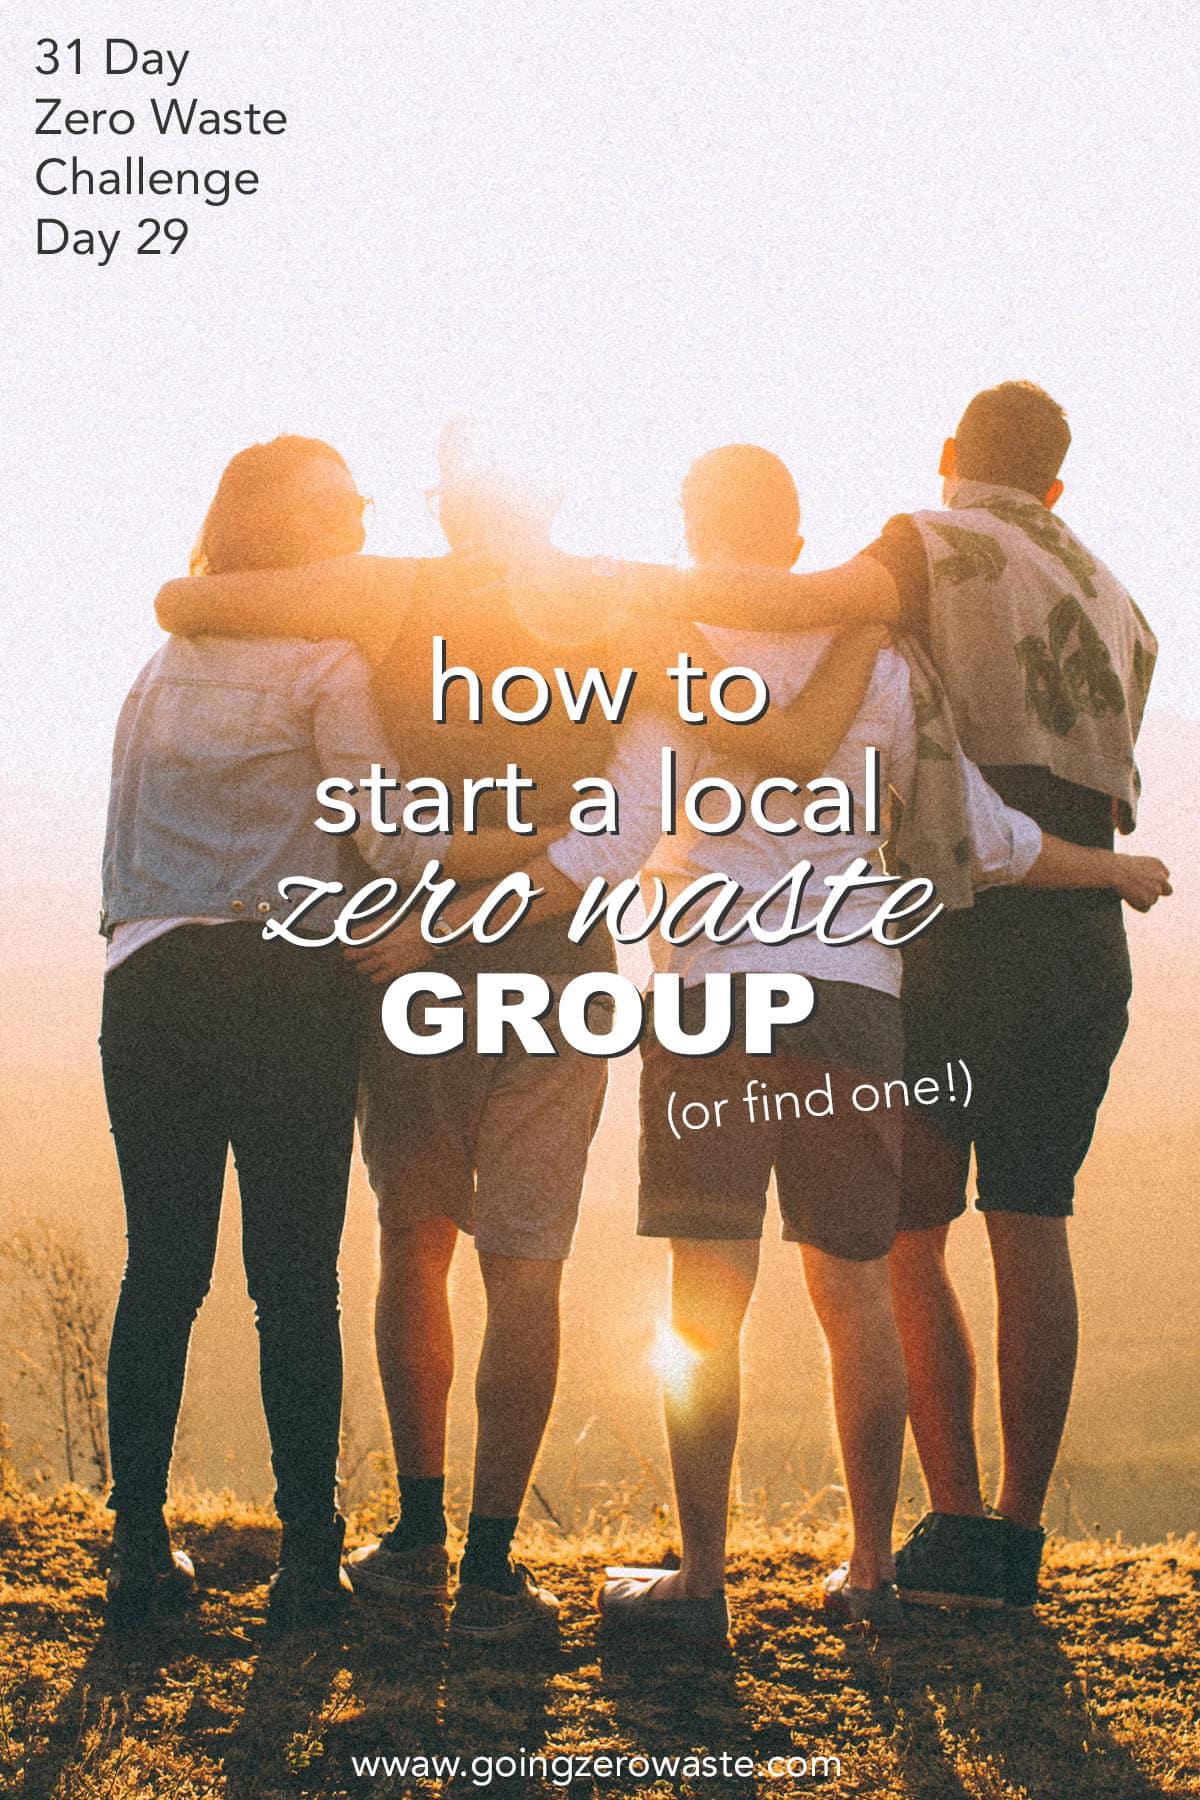 Start a Local Zero Waste Group - Day 29 of the Zero Waste Challenge